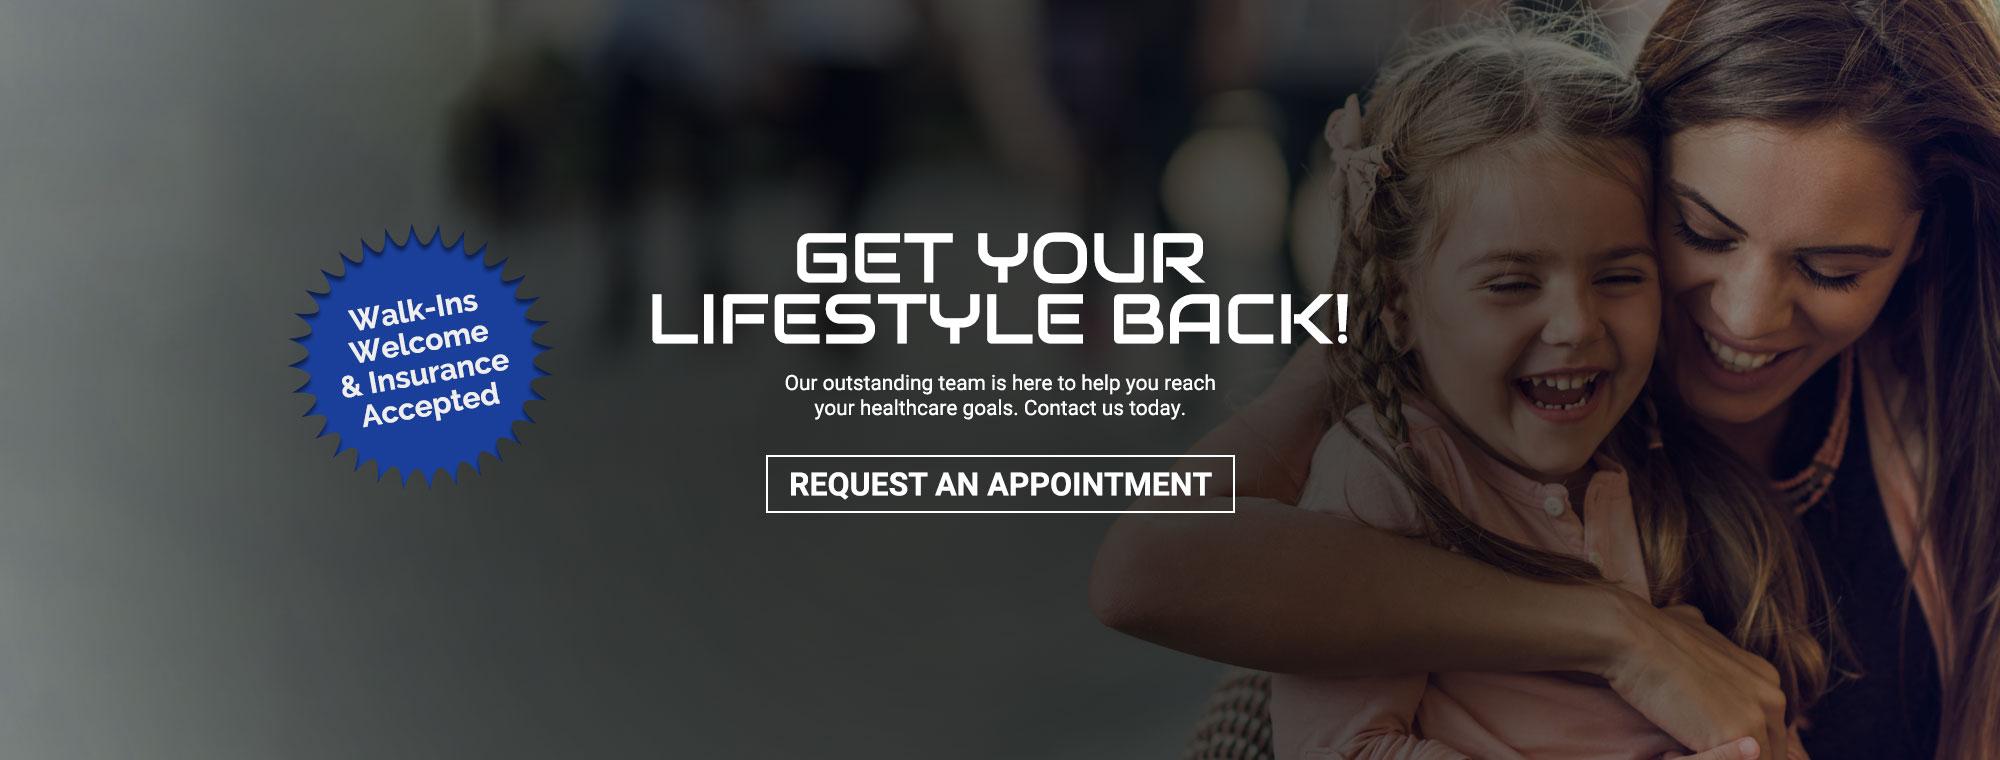 Chiropractic Burnsville MN Get Your Life Back Walk-Ins Welcome